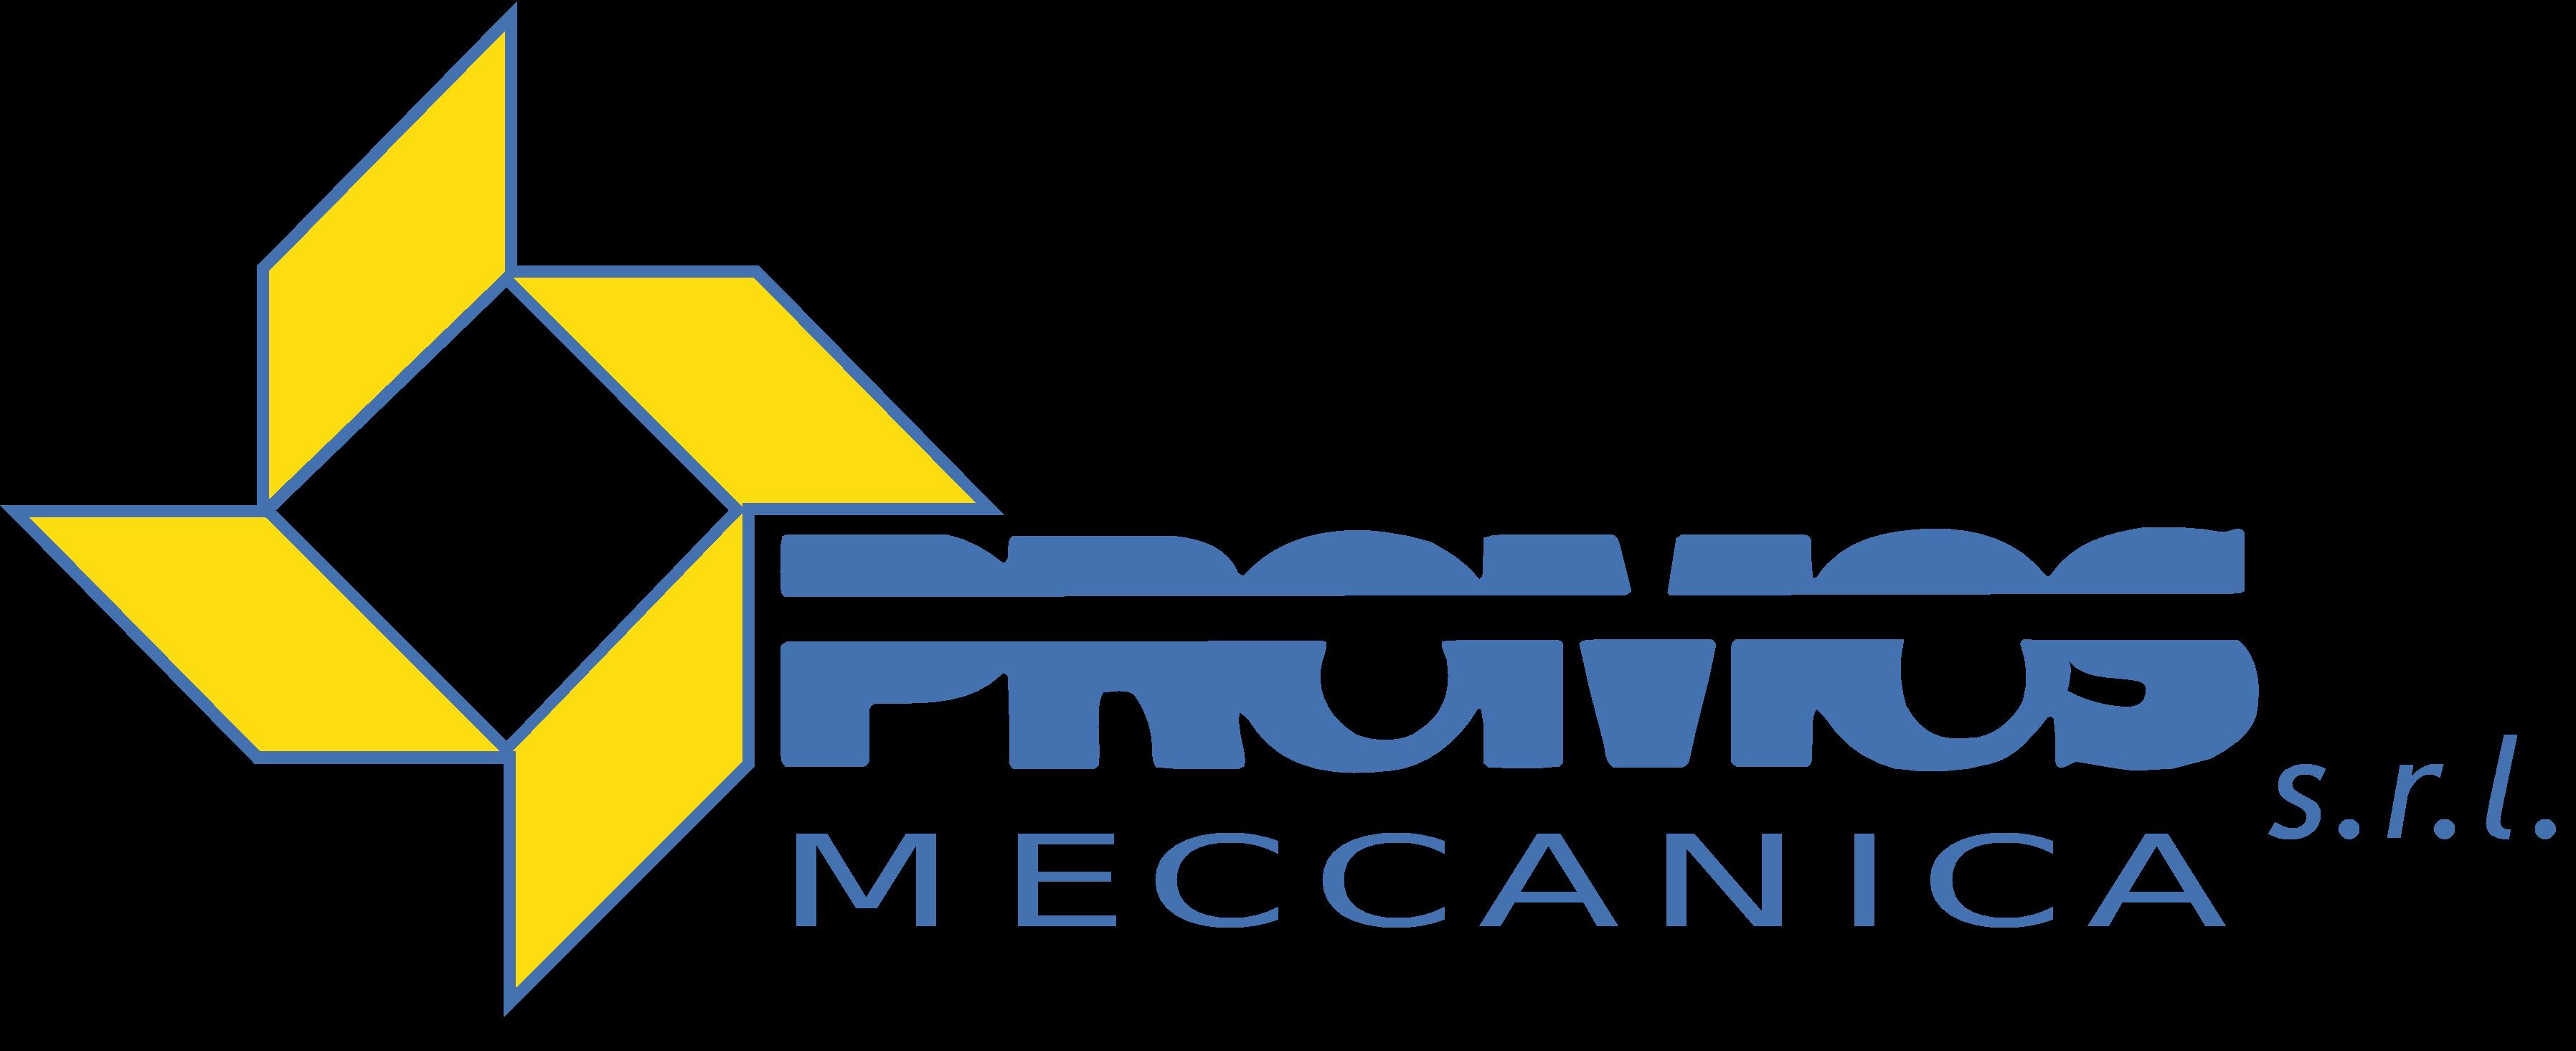 Logo meccanica Promos